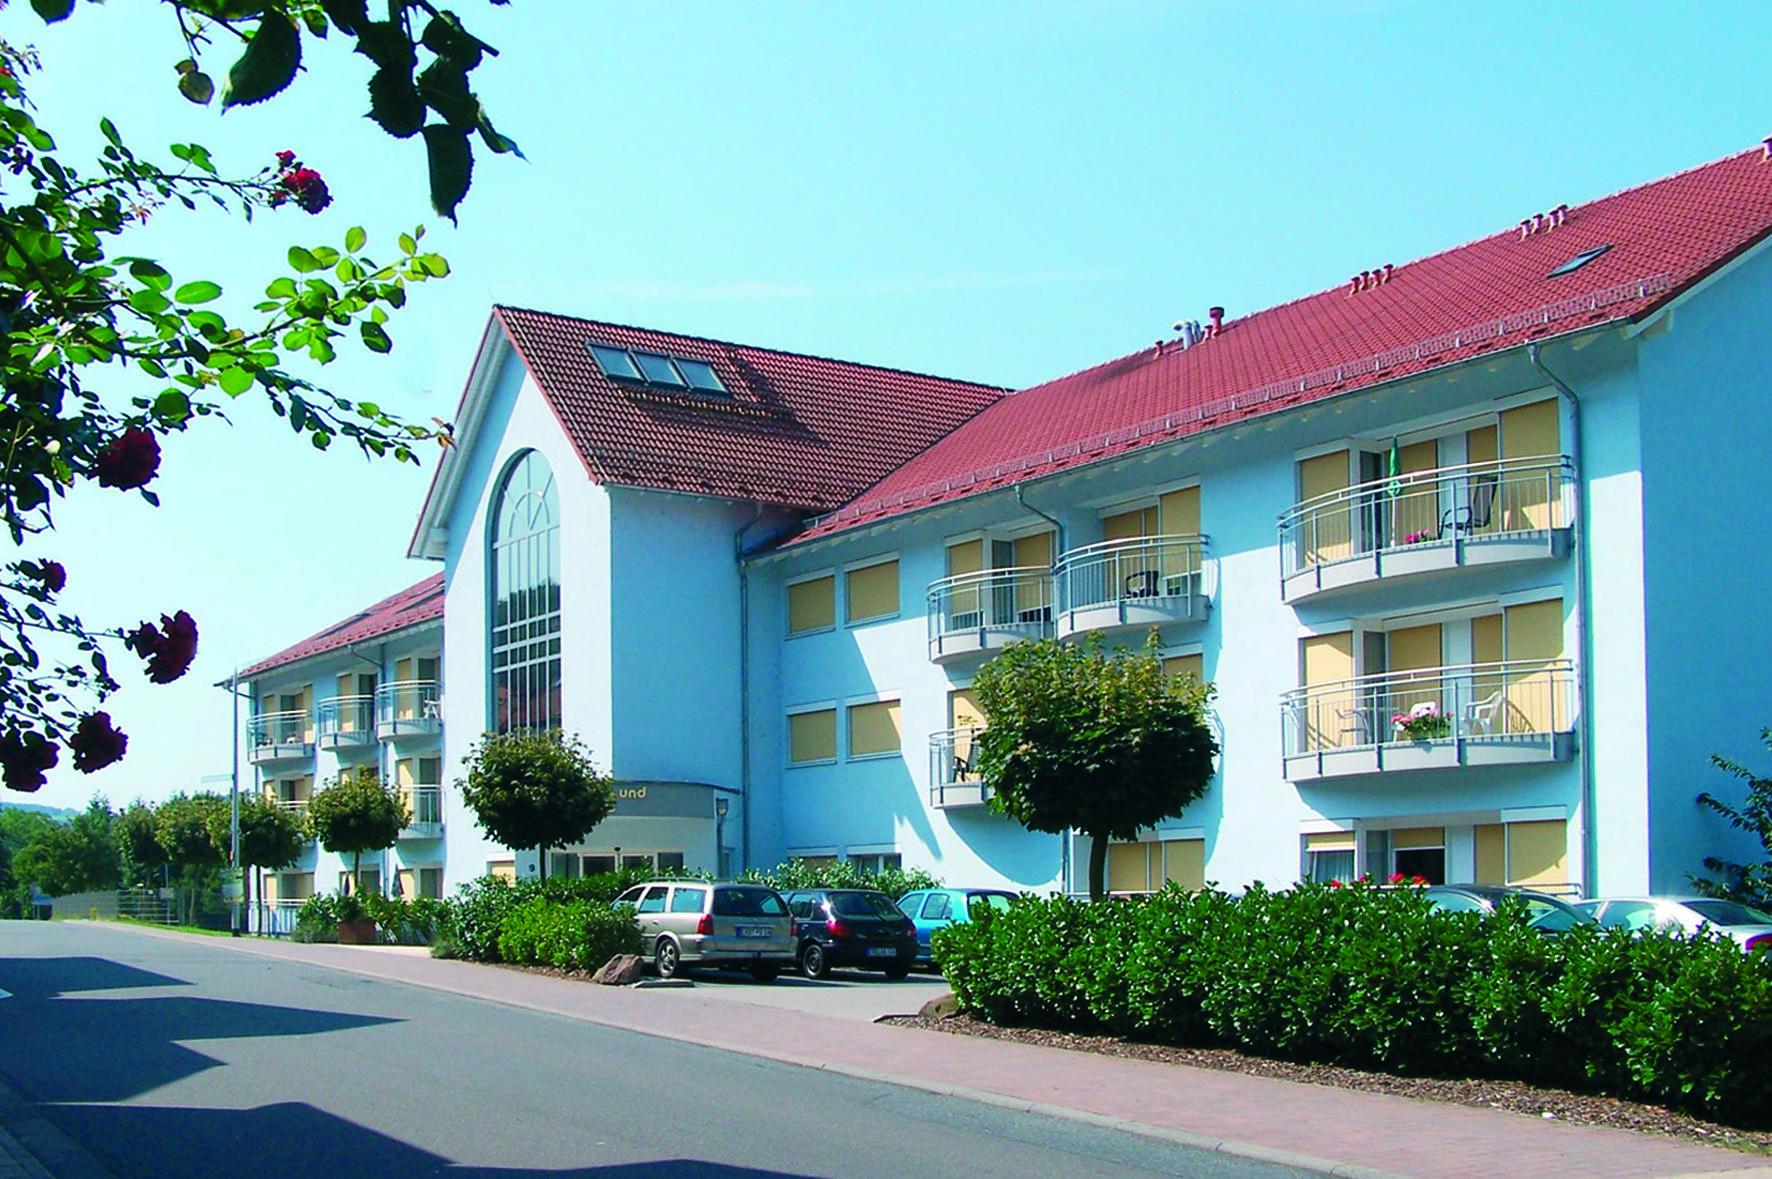 Seniorenwohn- & Pflegehaus Das